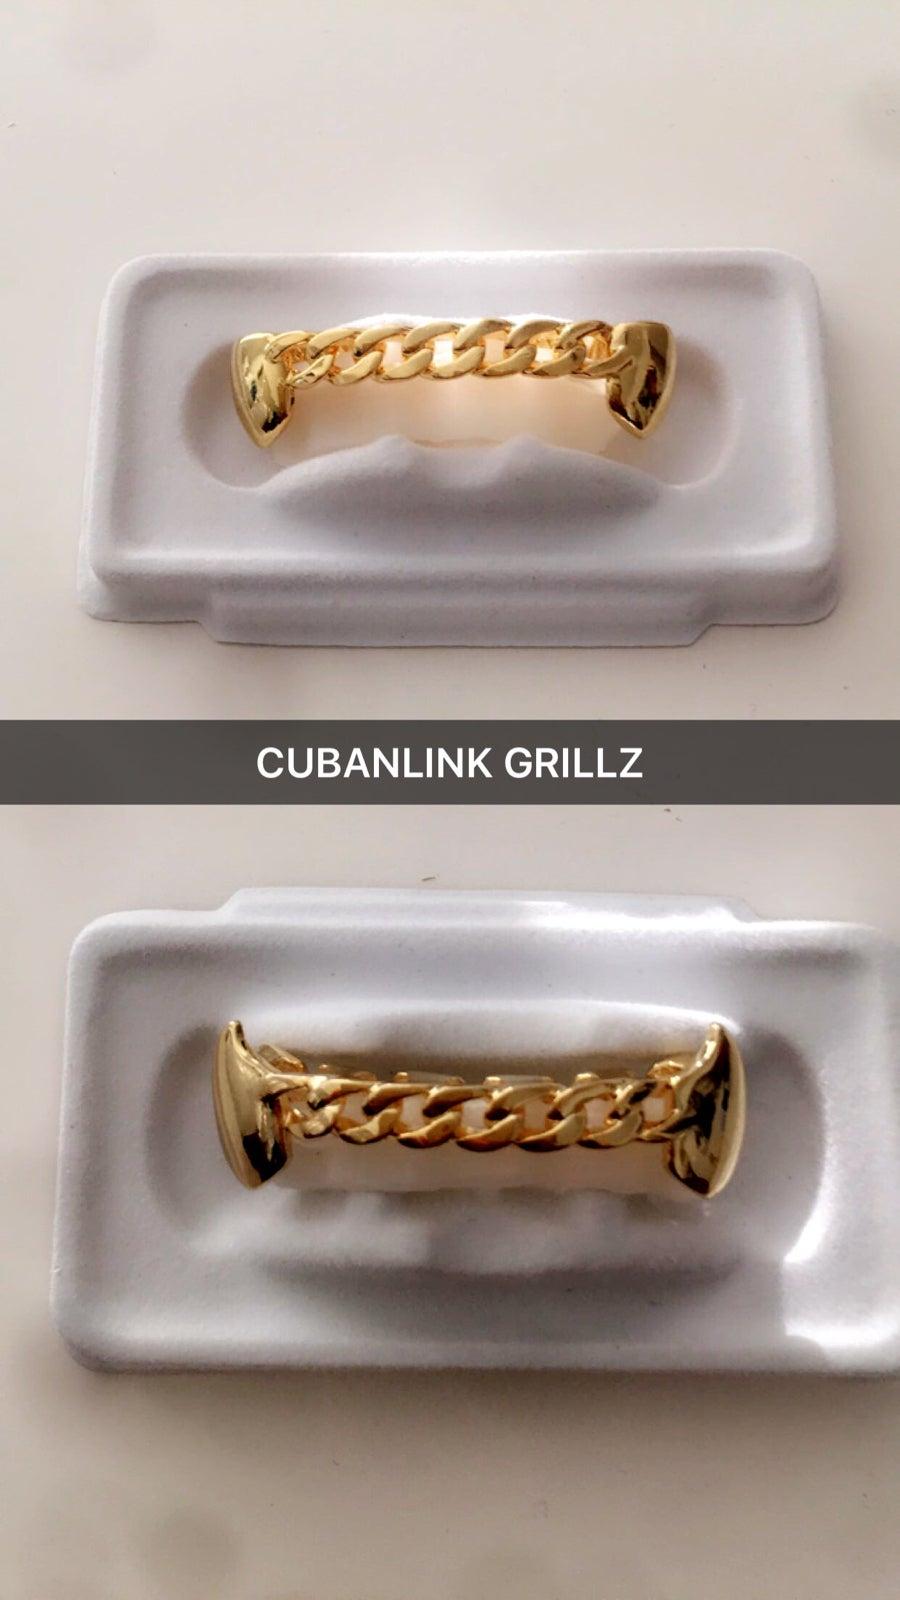 Image of CUBANLINK GRILL